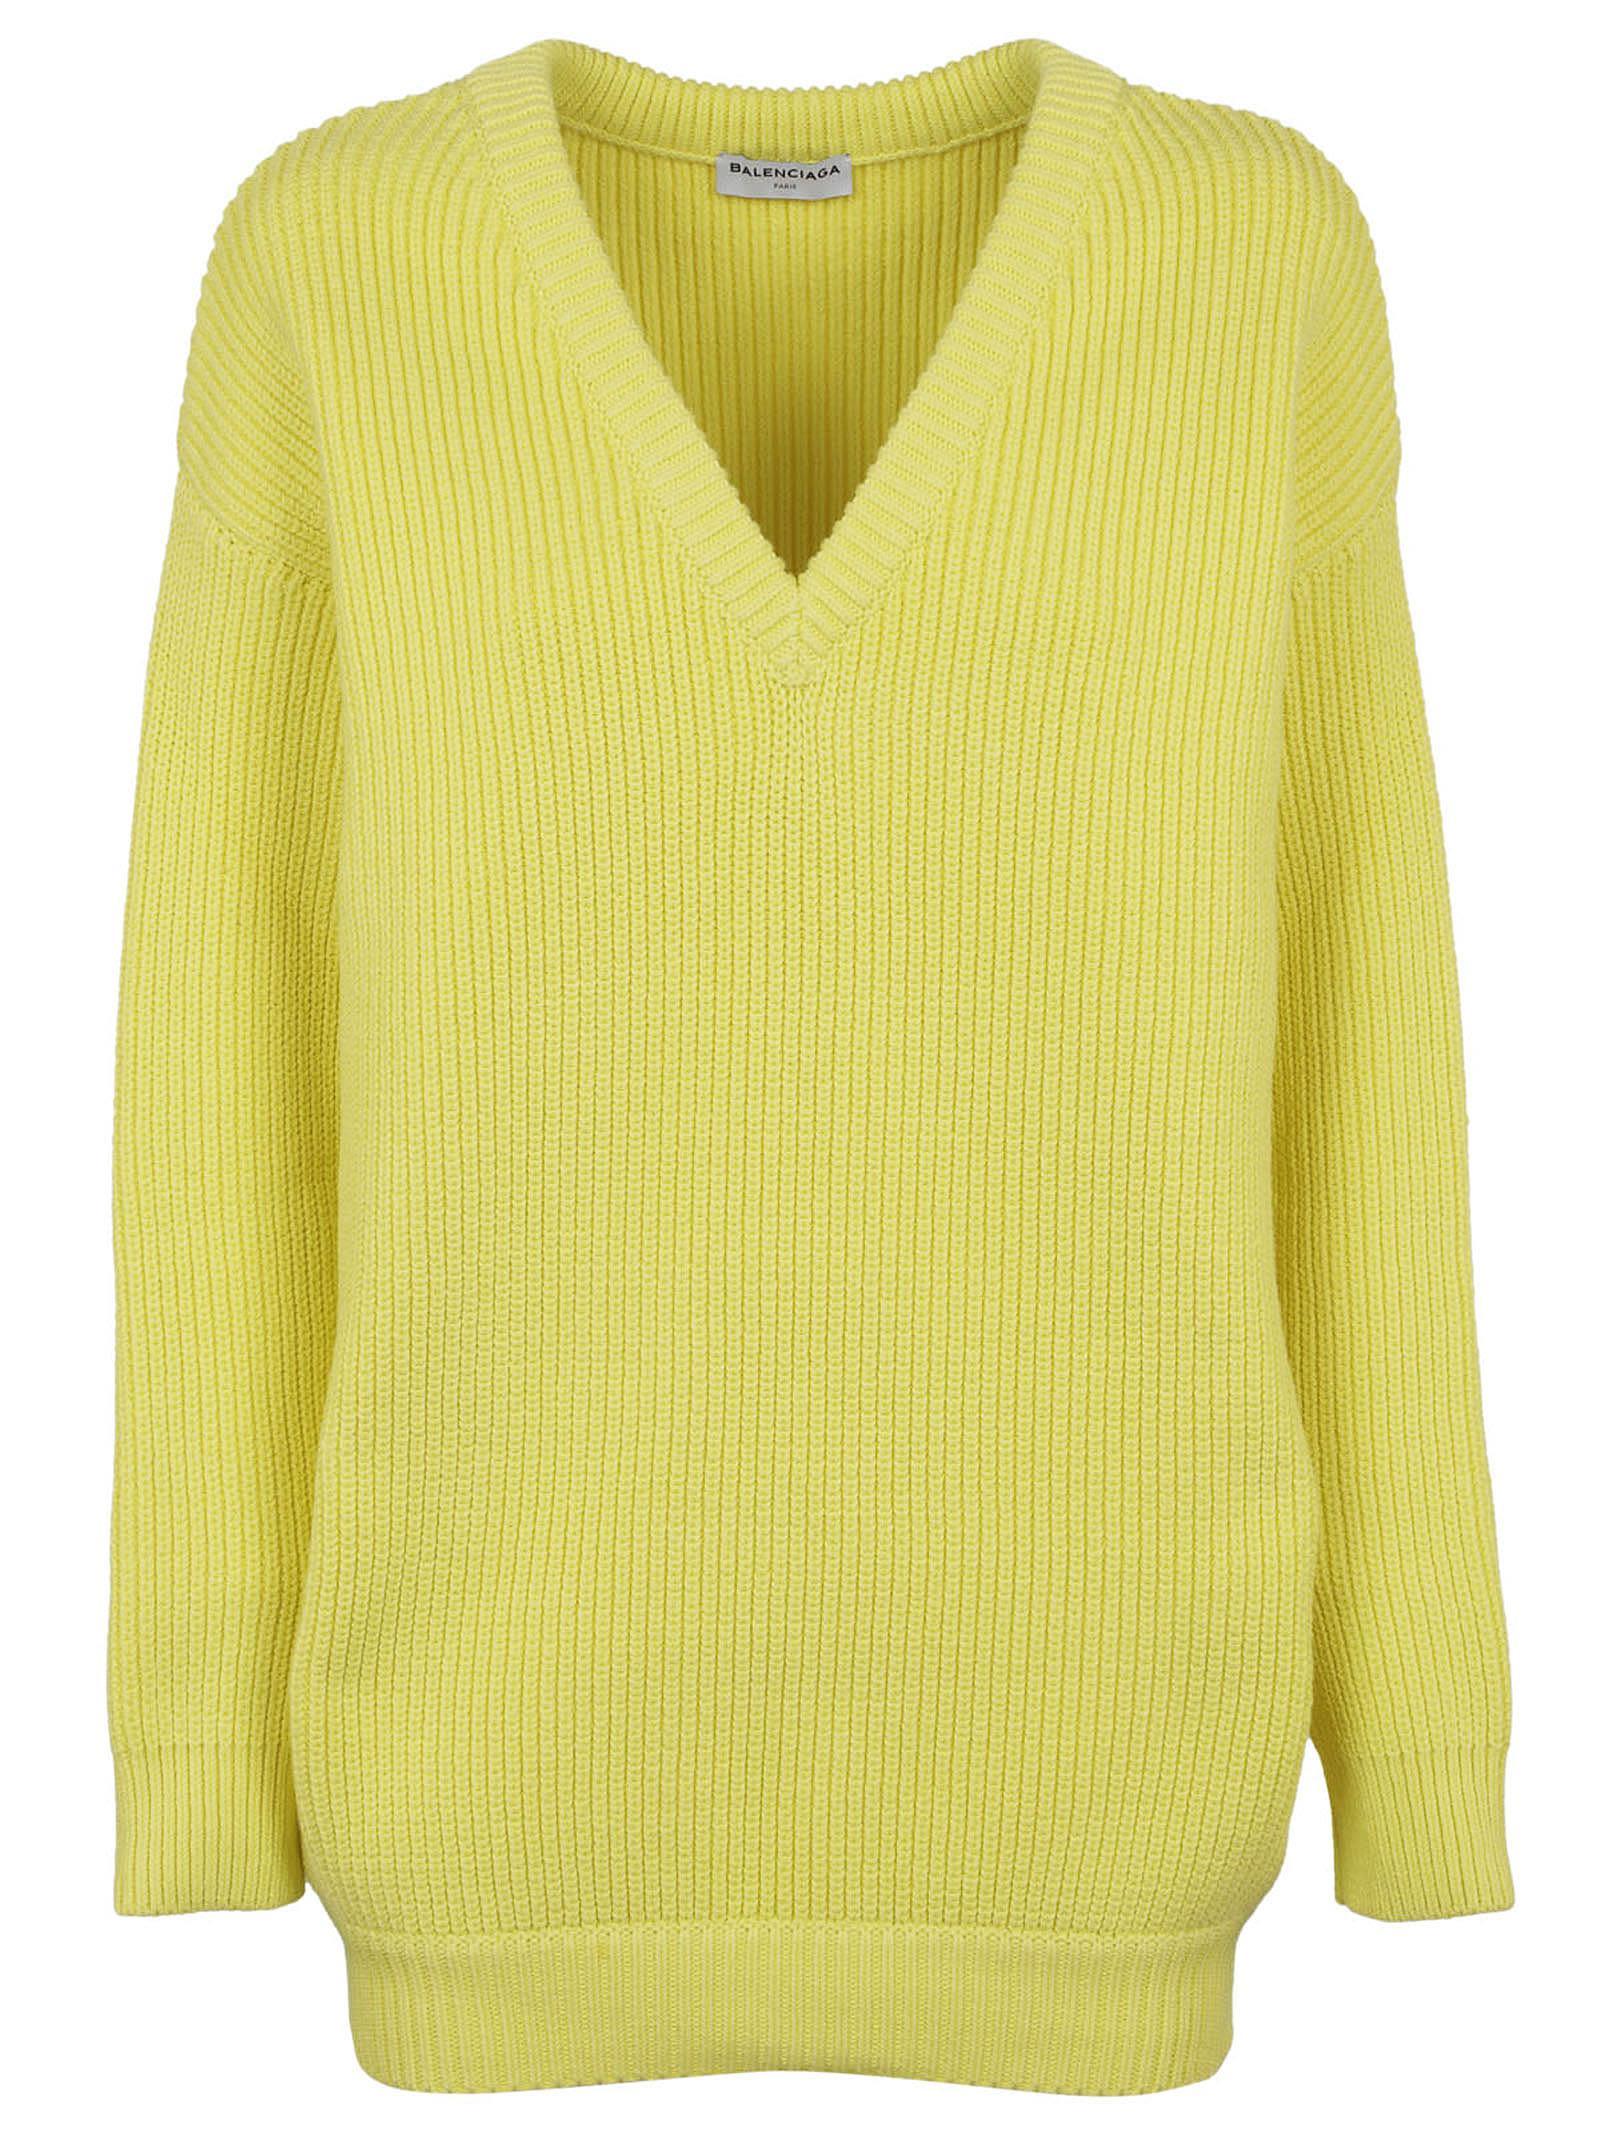 Balenciaga - Balenciaga Classic Sweater, Women's Sweaters | Italist